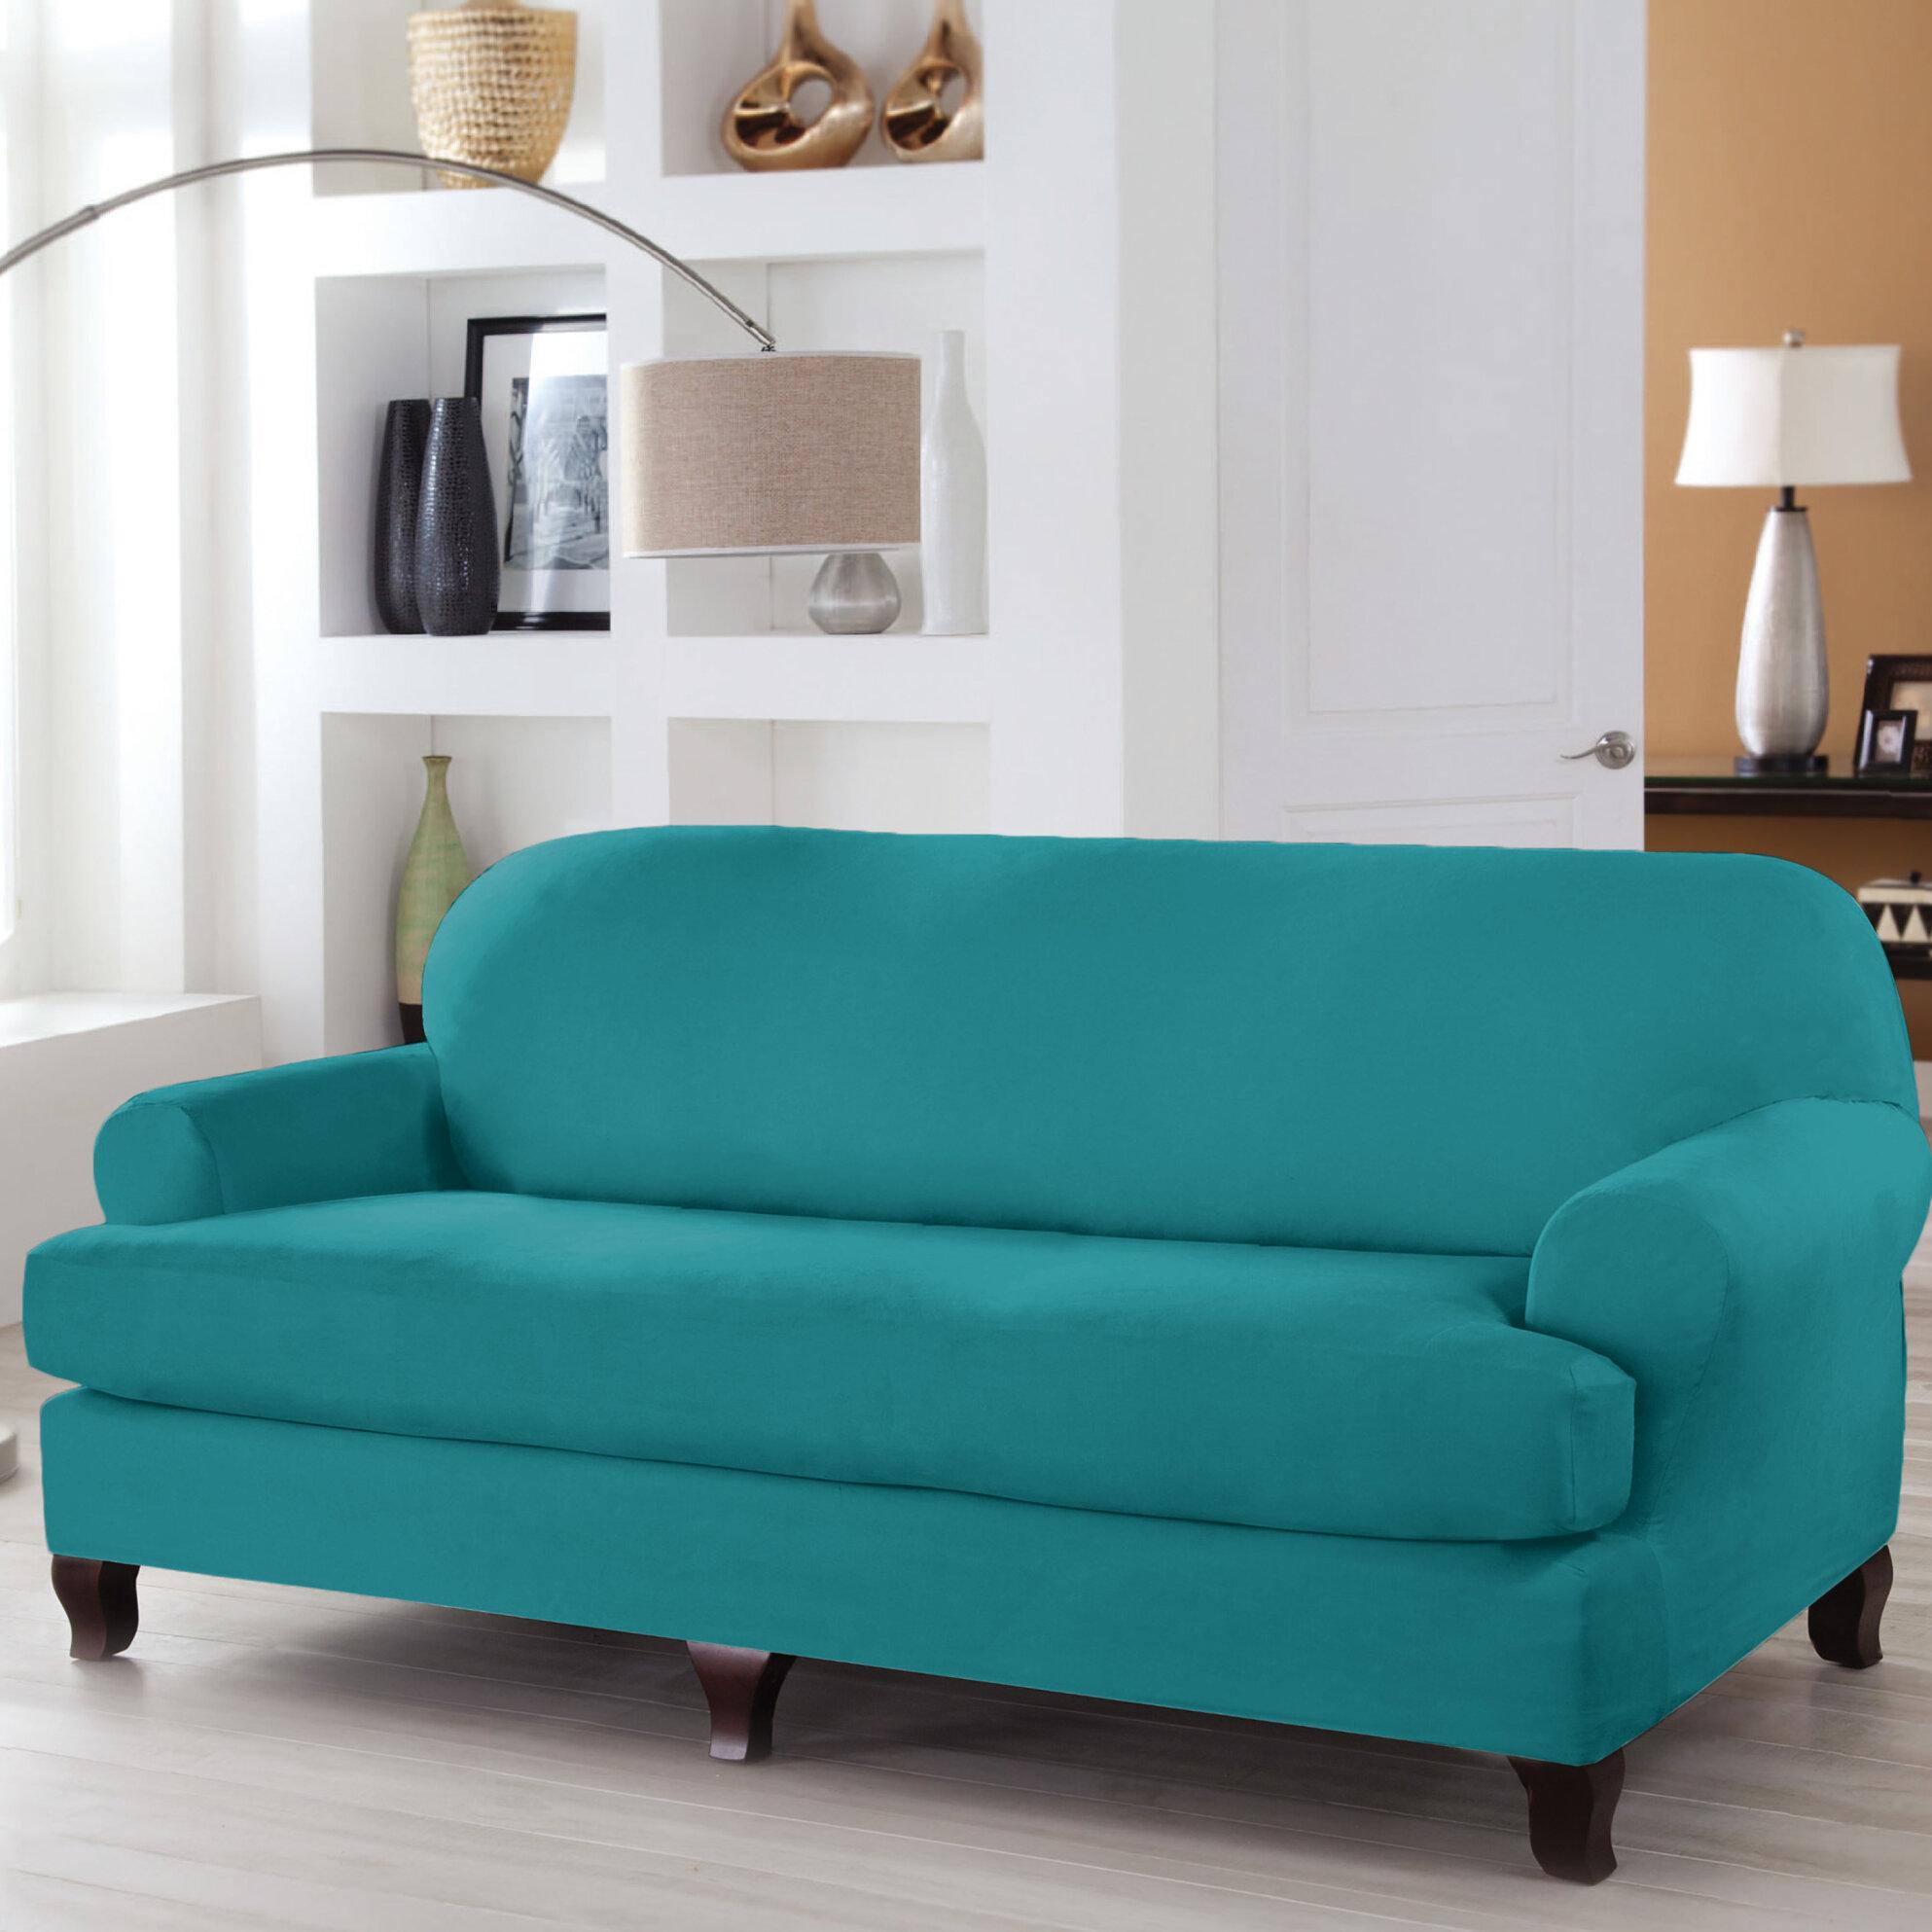 Serta® Stretch Fit T-Cushion Sofa Slipcover & Reviews | Wayfair